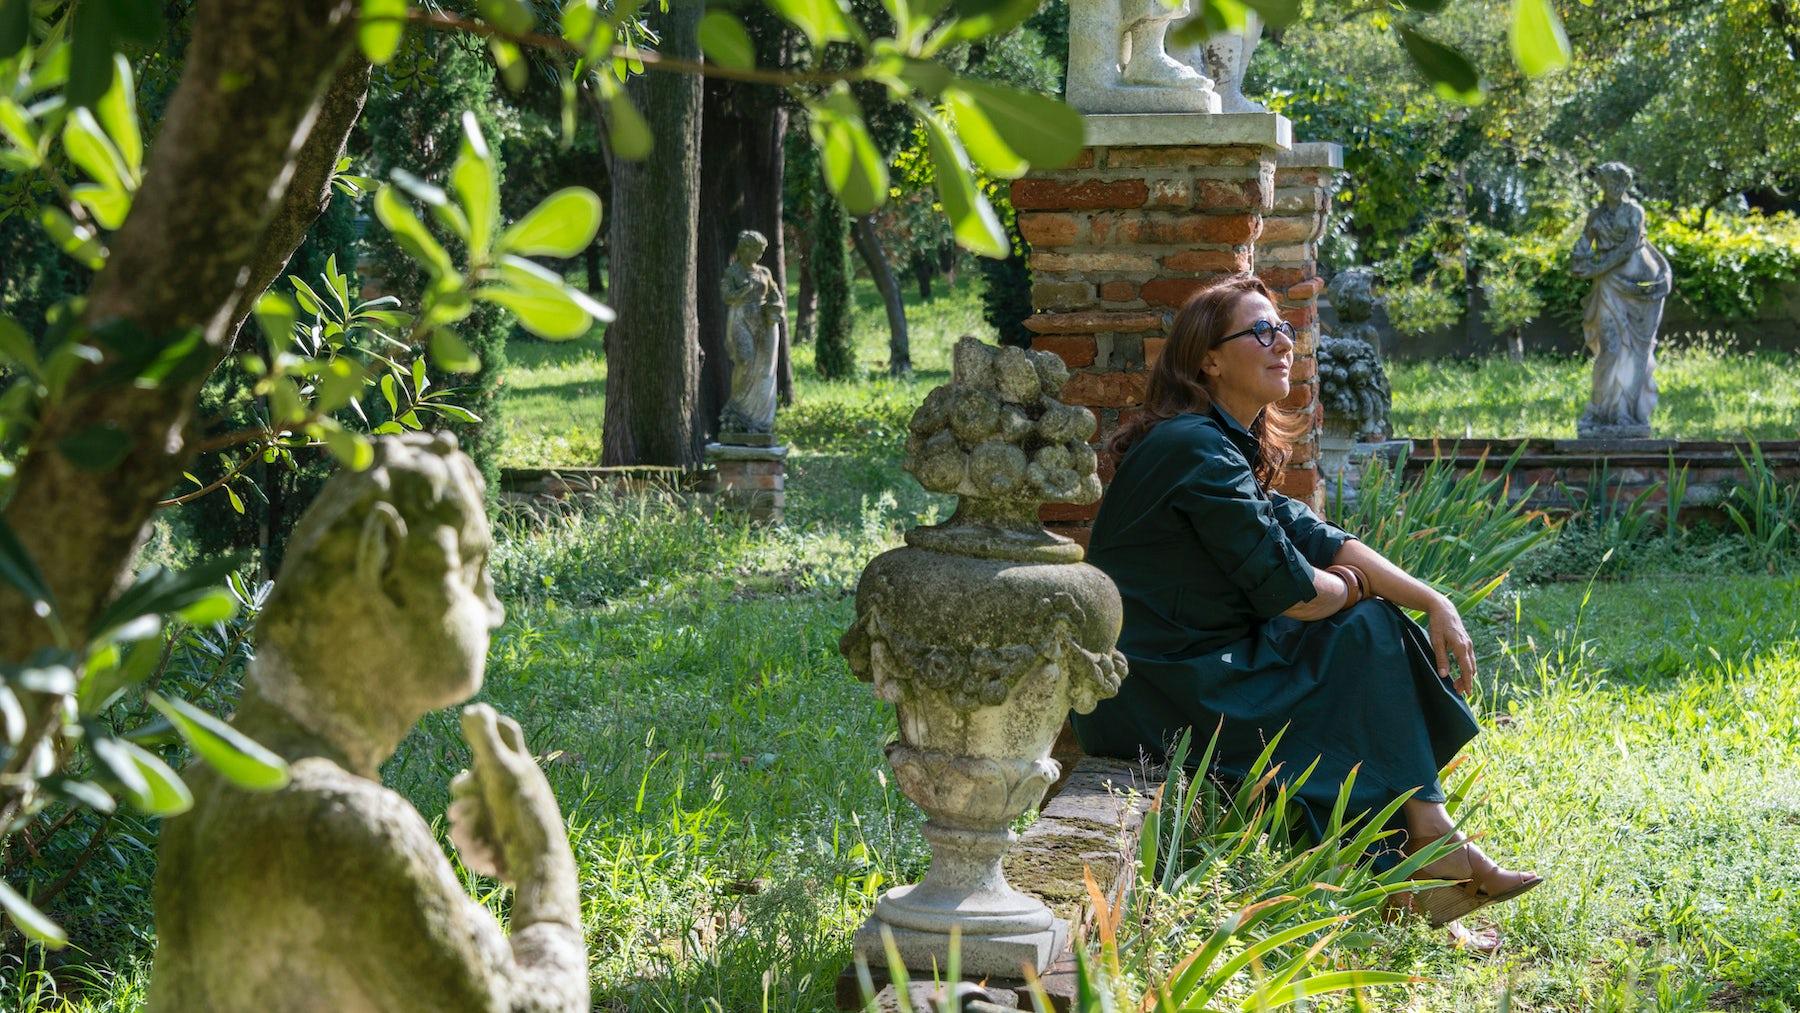 Chrstine Nagel, Hermès Nose, in the Garden of Eden in Venice | Source: Courtesy